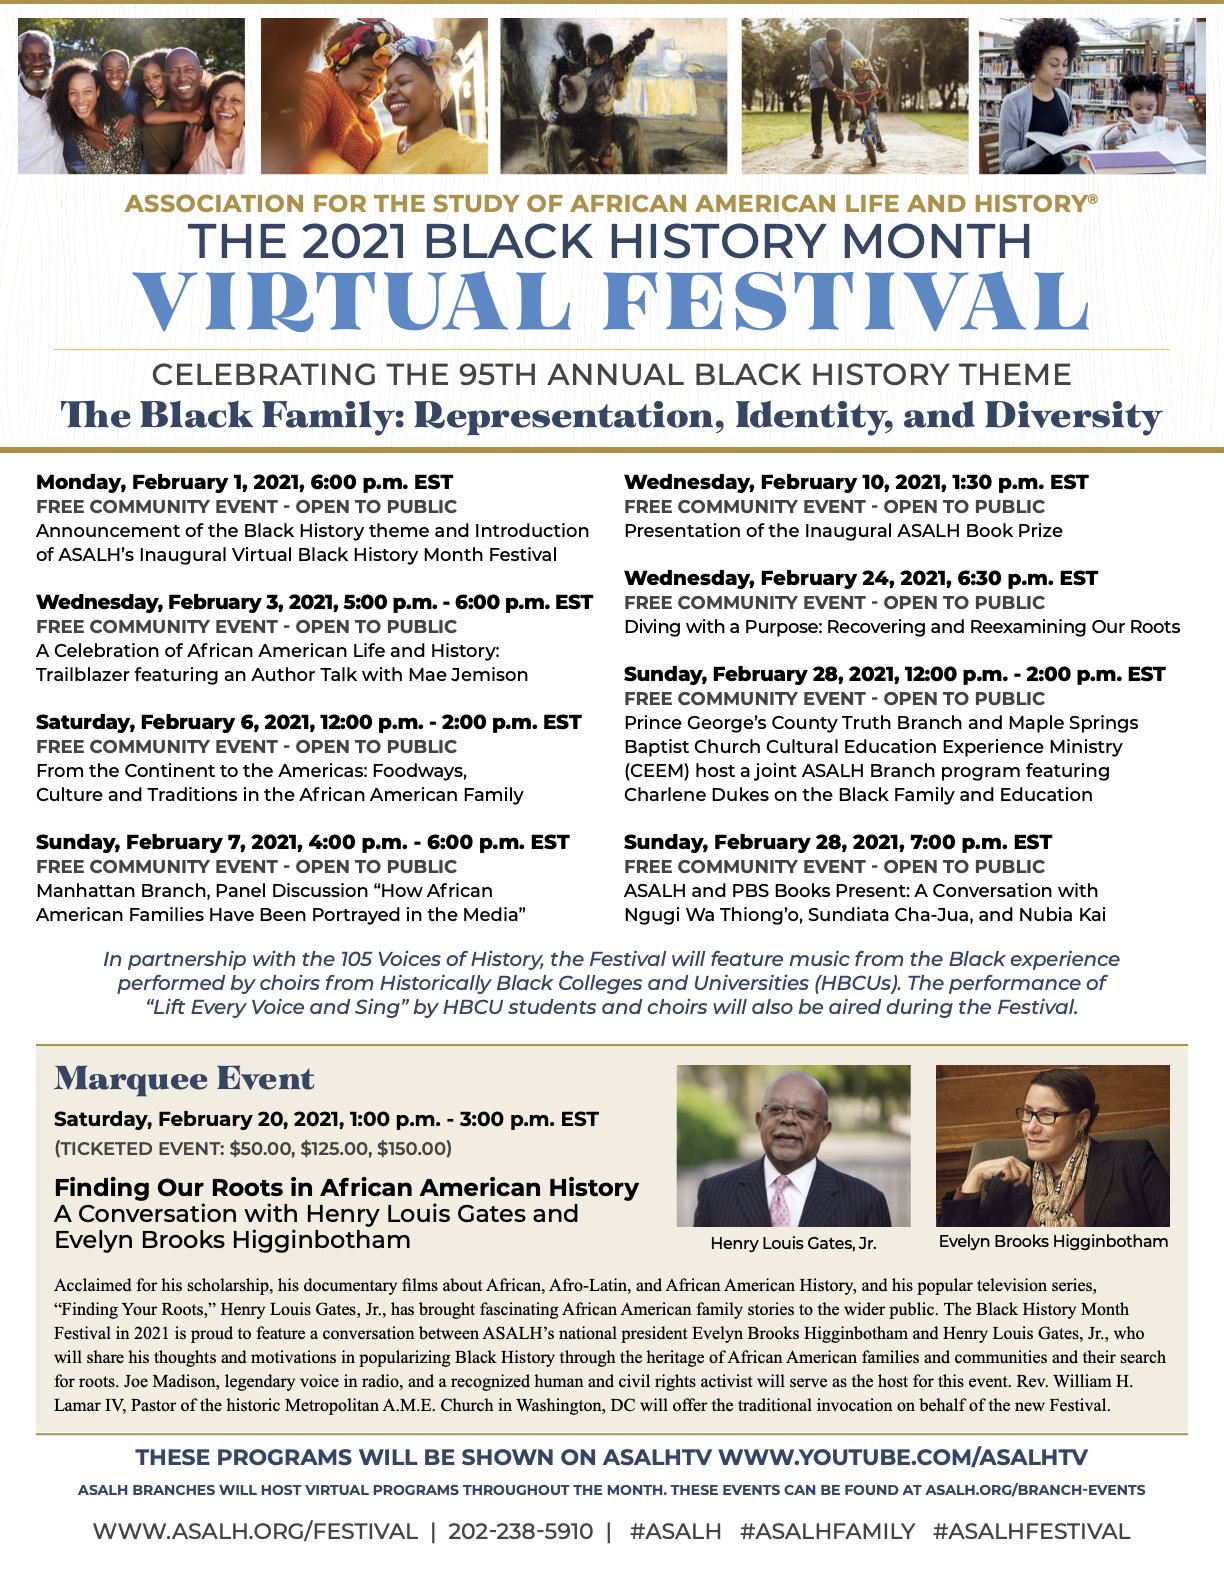 2021 Virtual Black History Month Festival